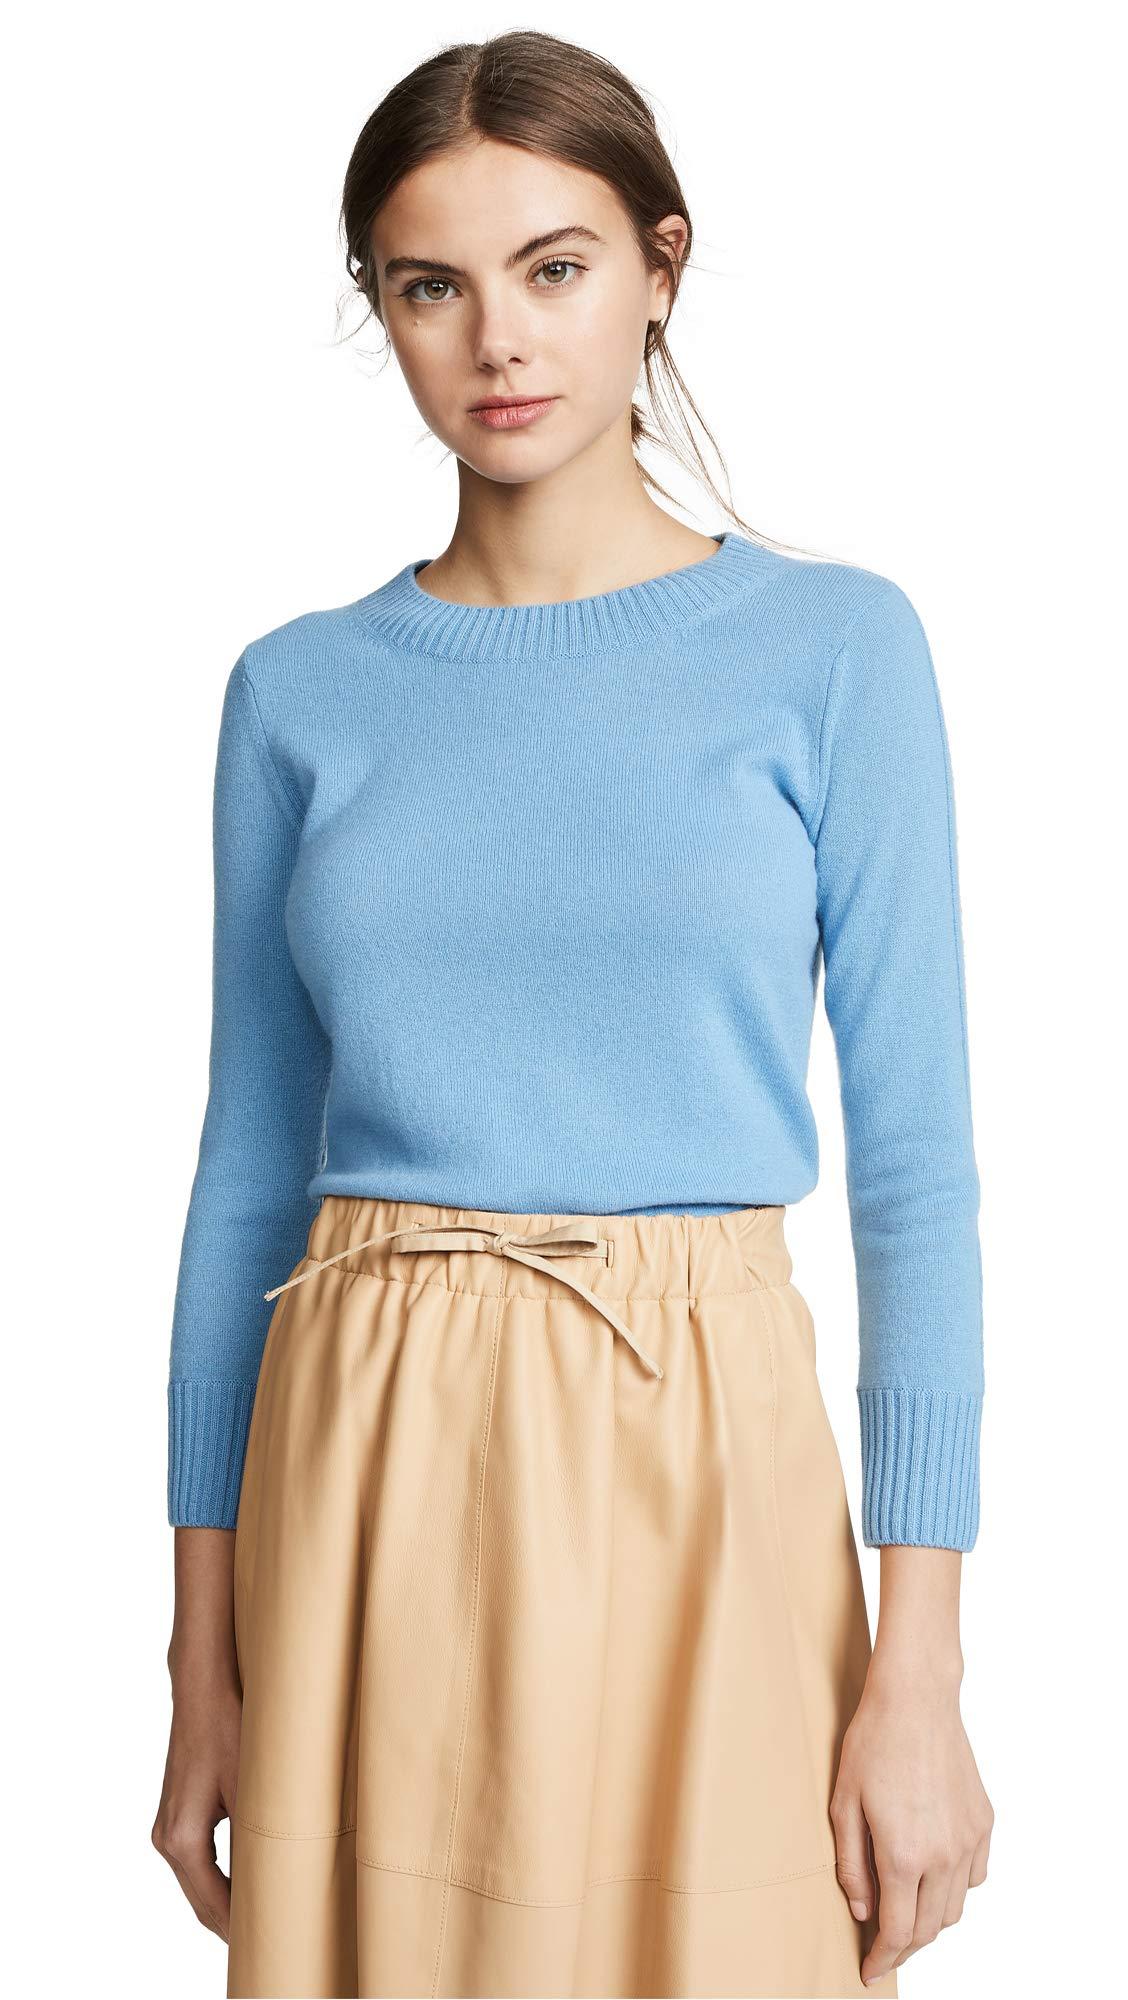 Vince Women's Shrunken Cashmere Pullover